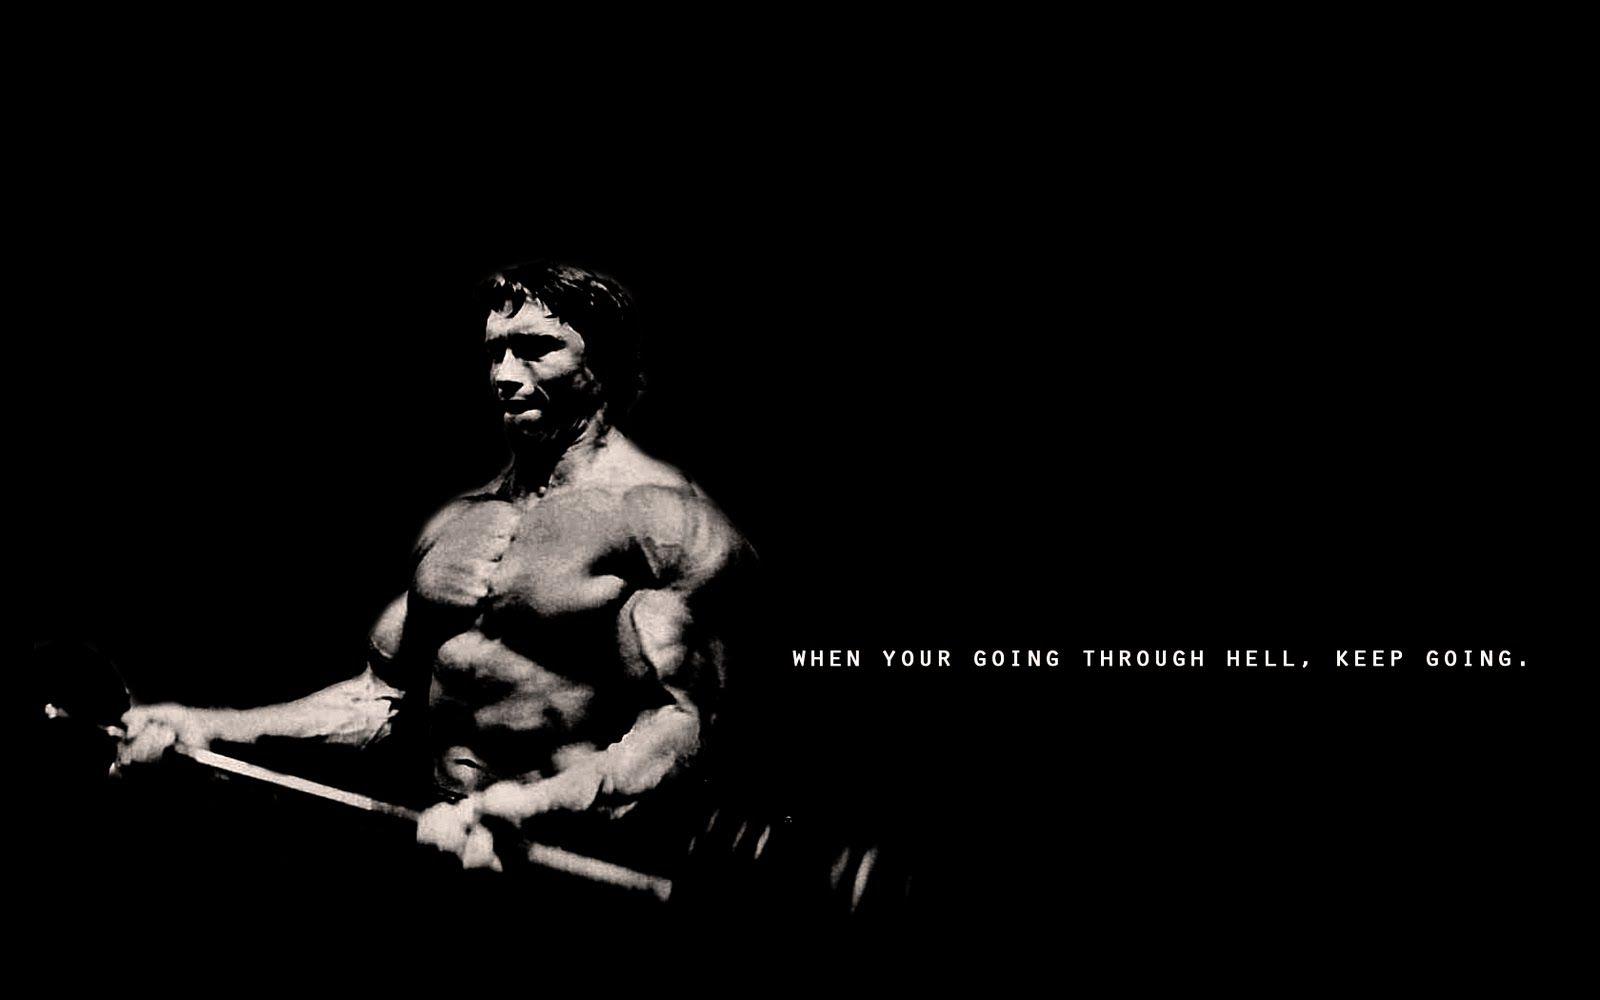 Arnold Schwarzenegger Gym Motivation Wallpaper Fitness Motivation Wallpaper Aesthetics Bodybuilding